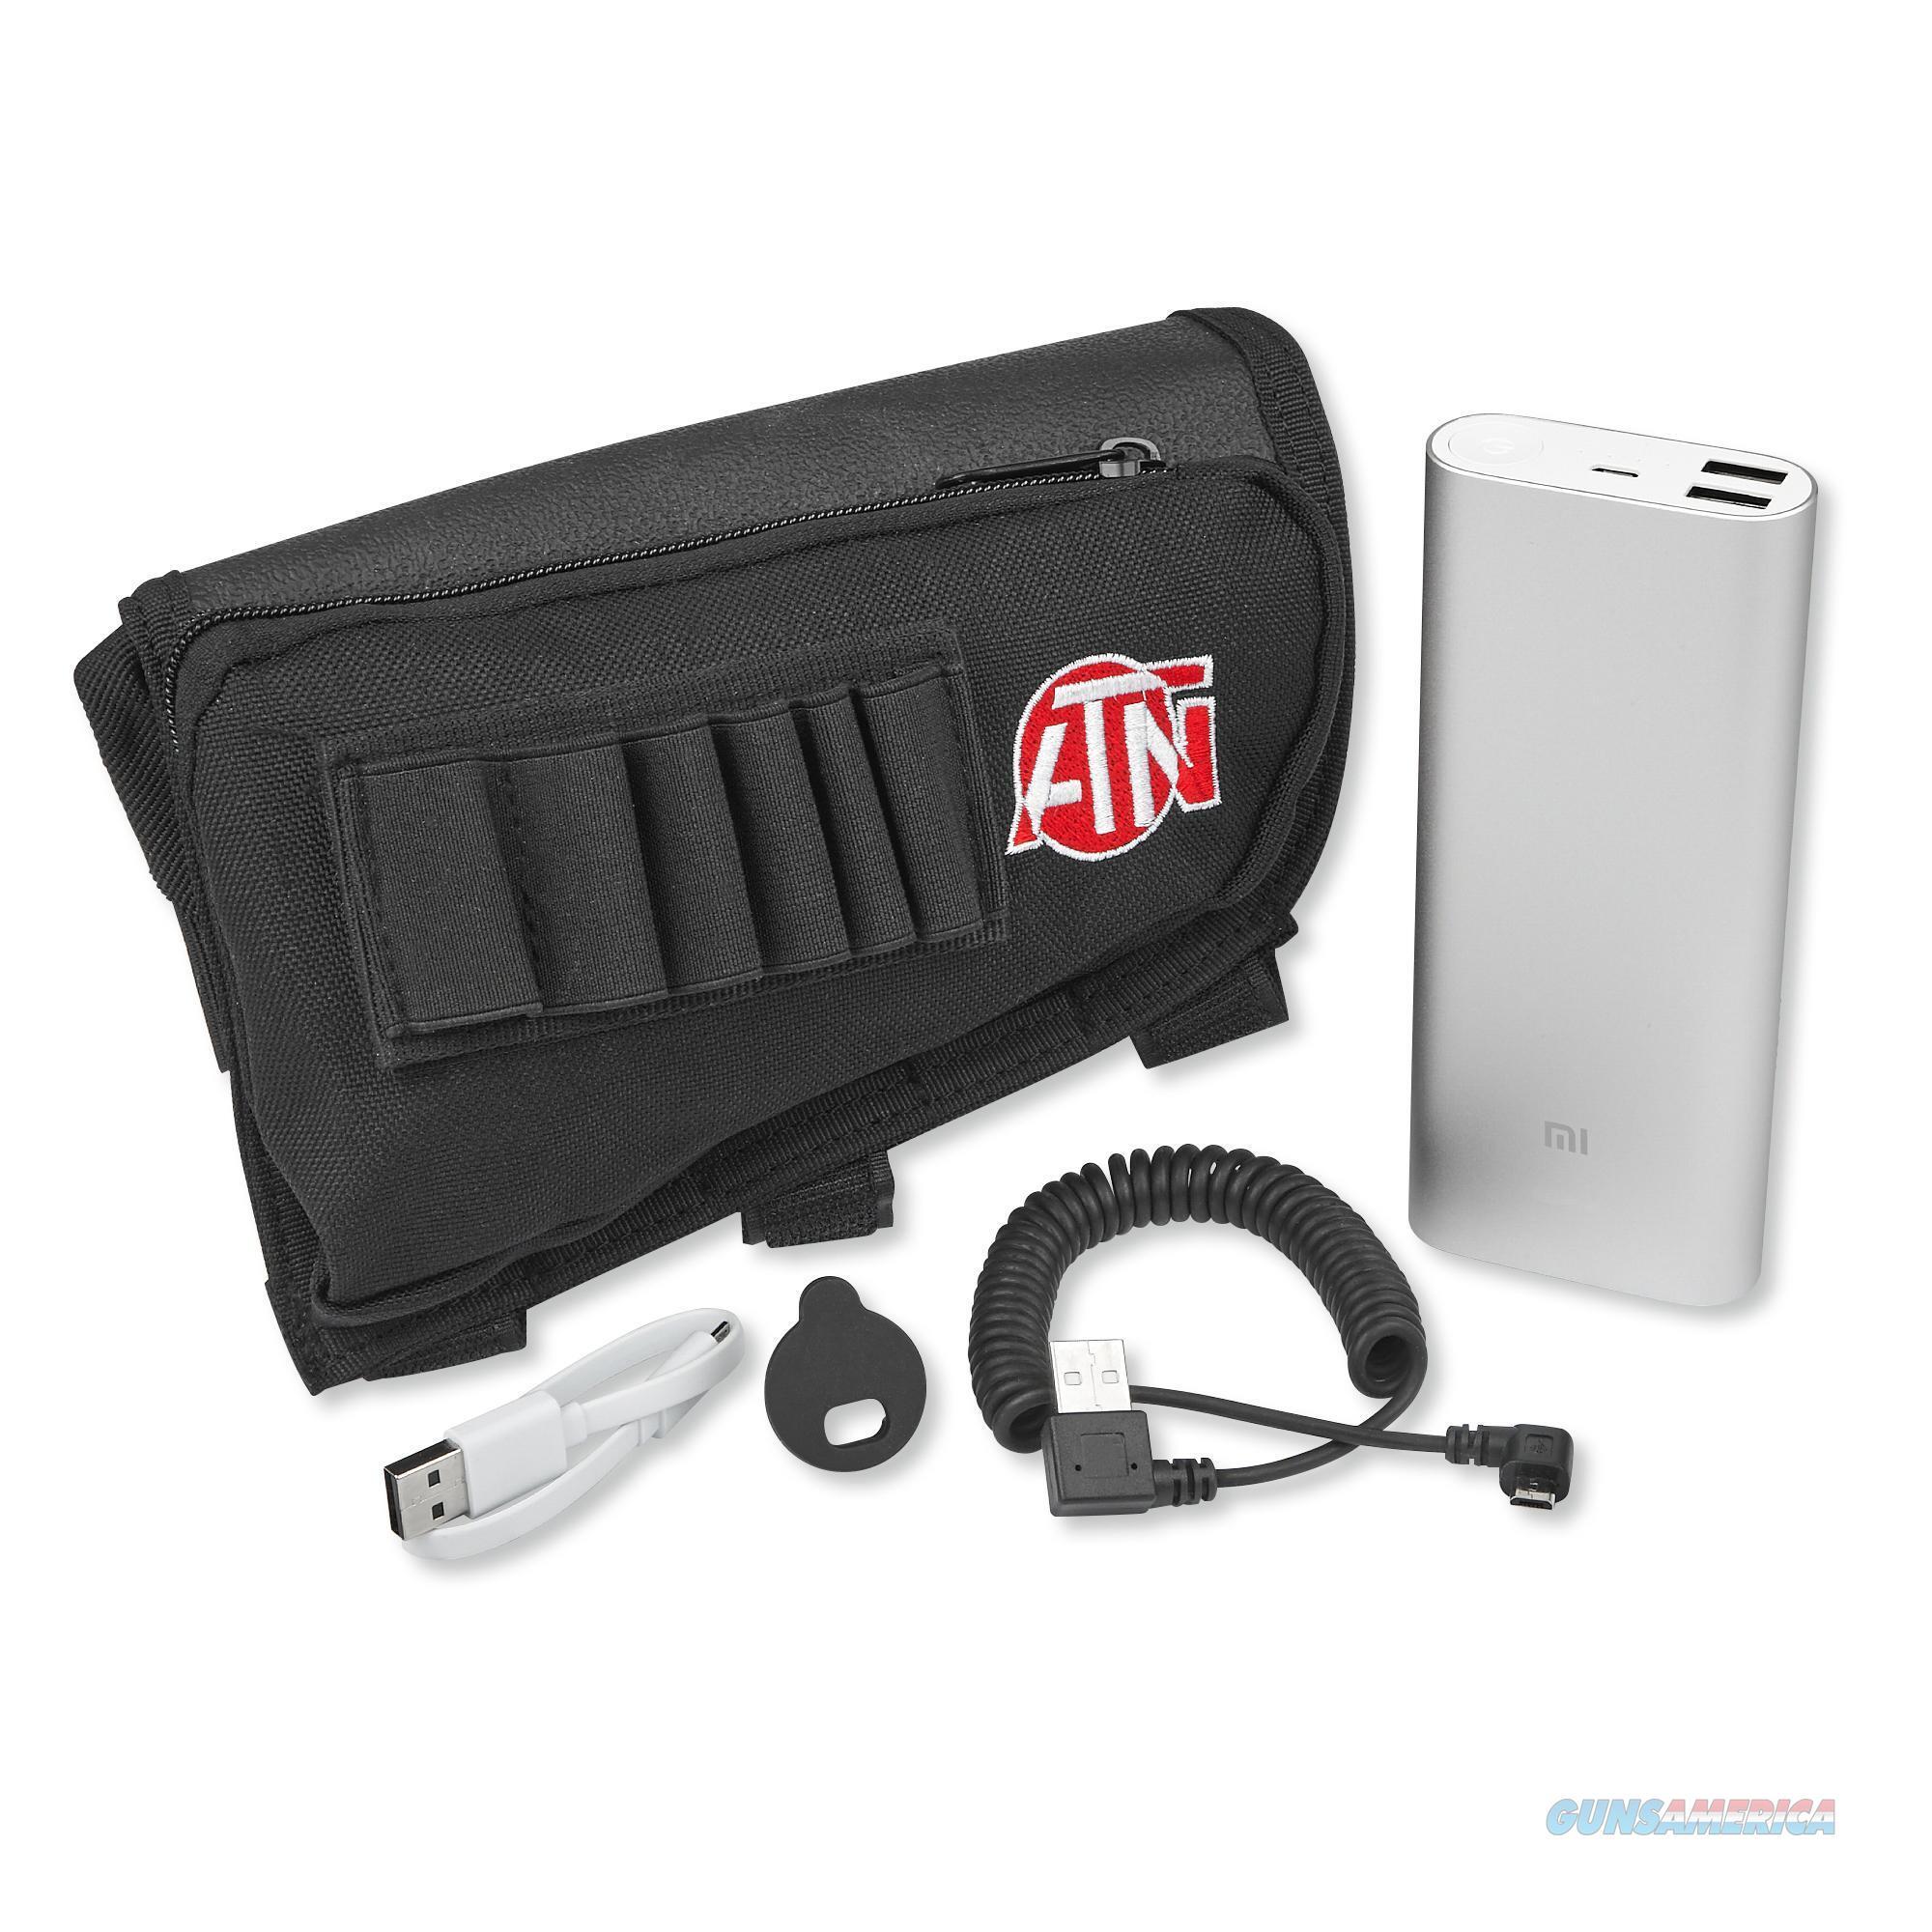 ATN Extended Life Battery Pack ACMUBAT160 NEW  Non-Guns > Night Vision